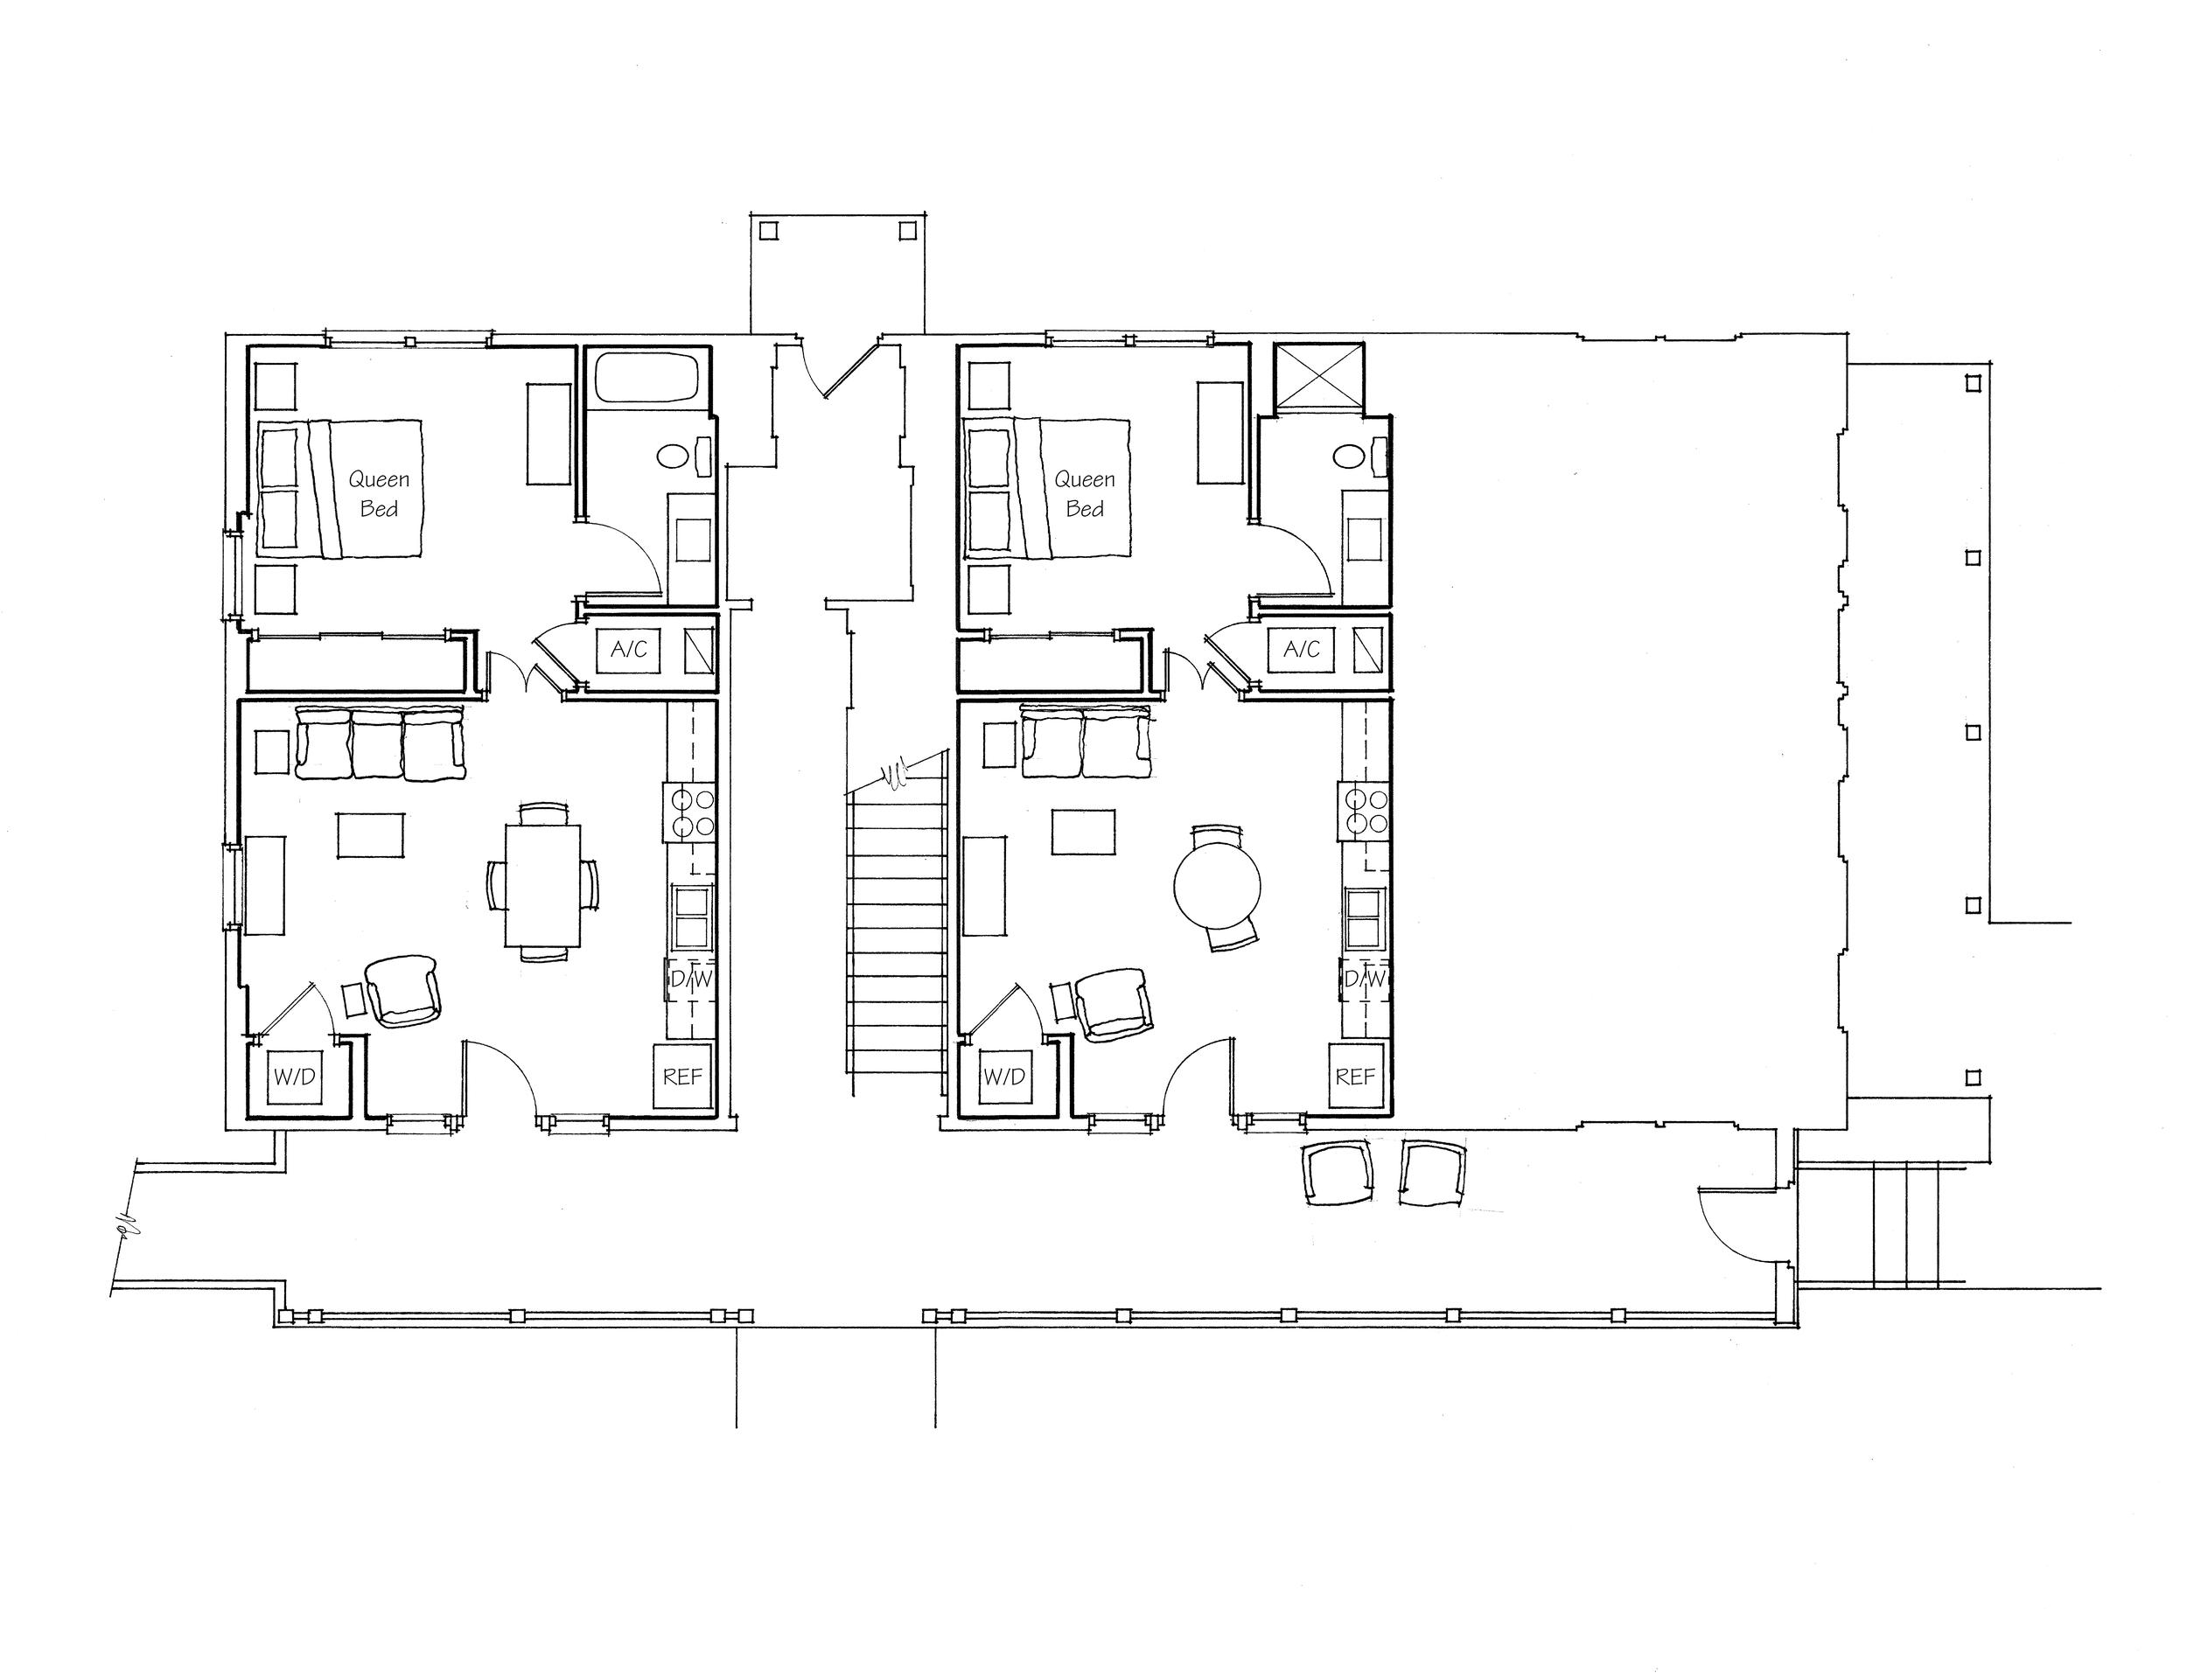 208 W. 22nd St. - 1st Floor